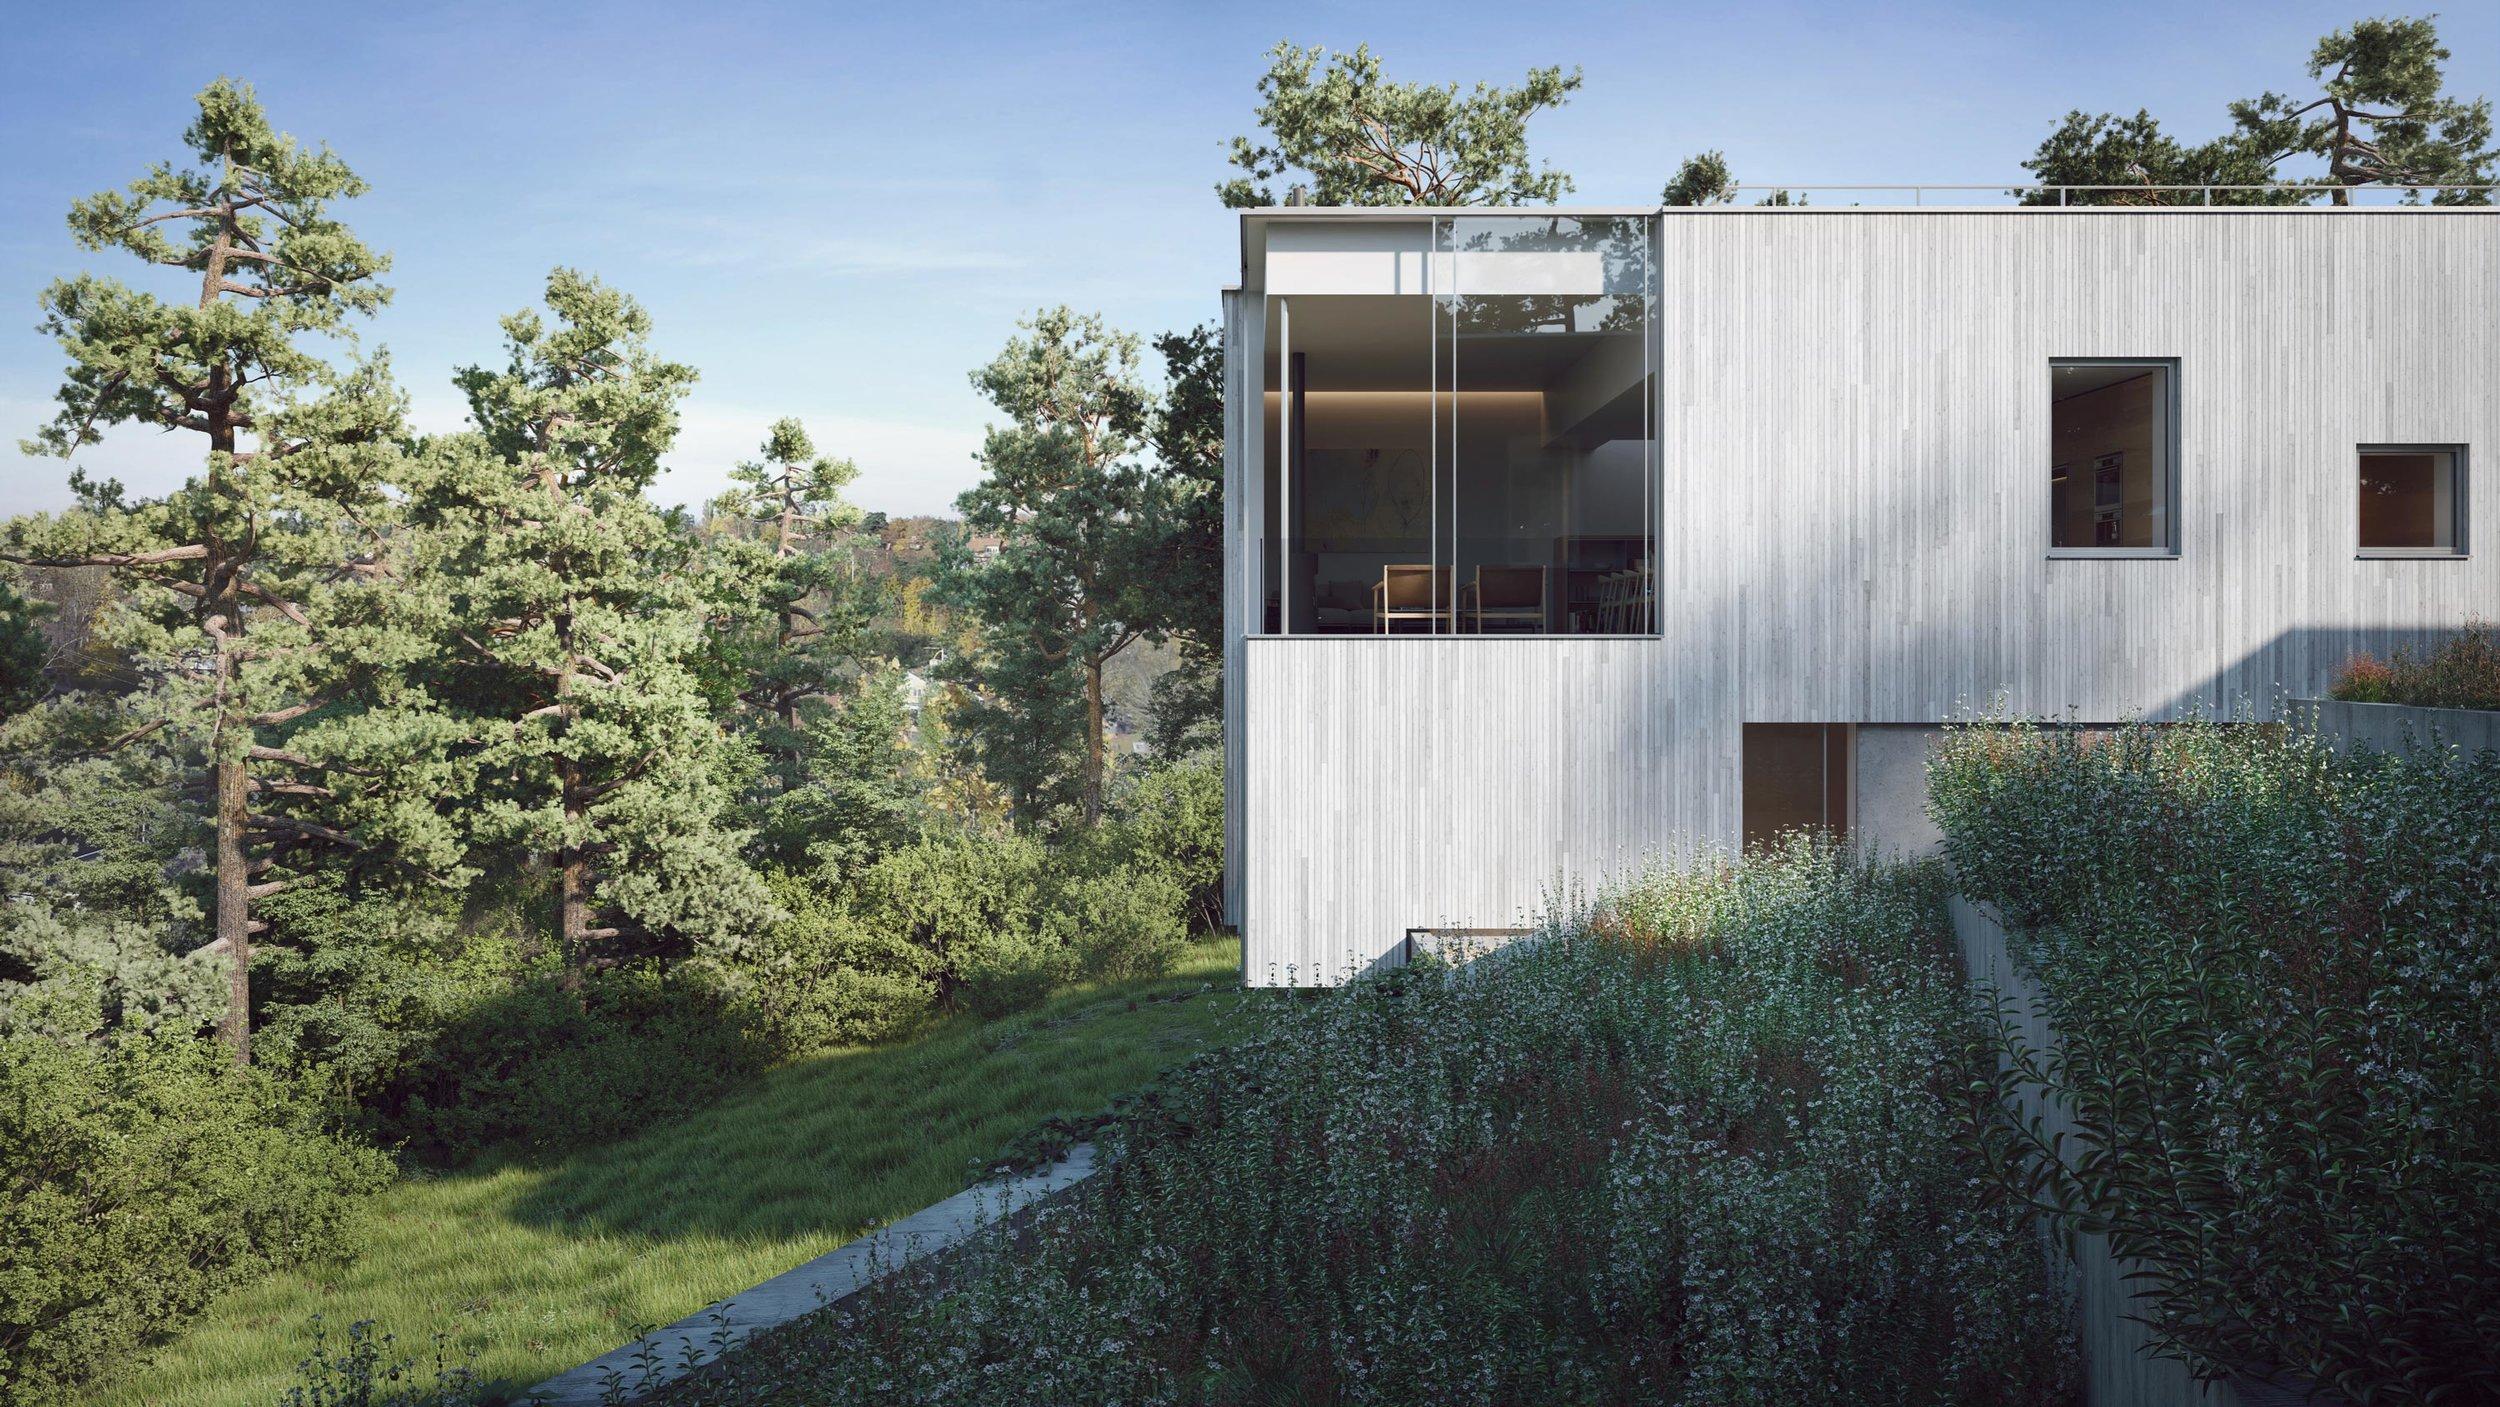 pyrus luxury villas, strom architects, imola, 2.jpg